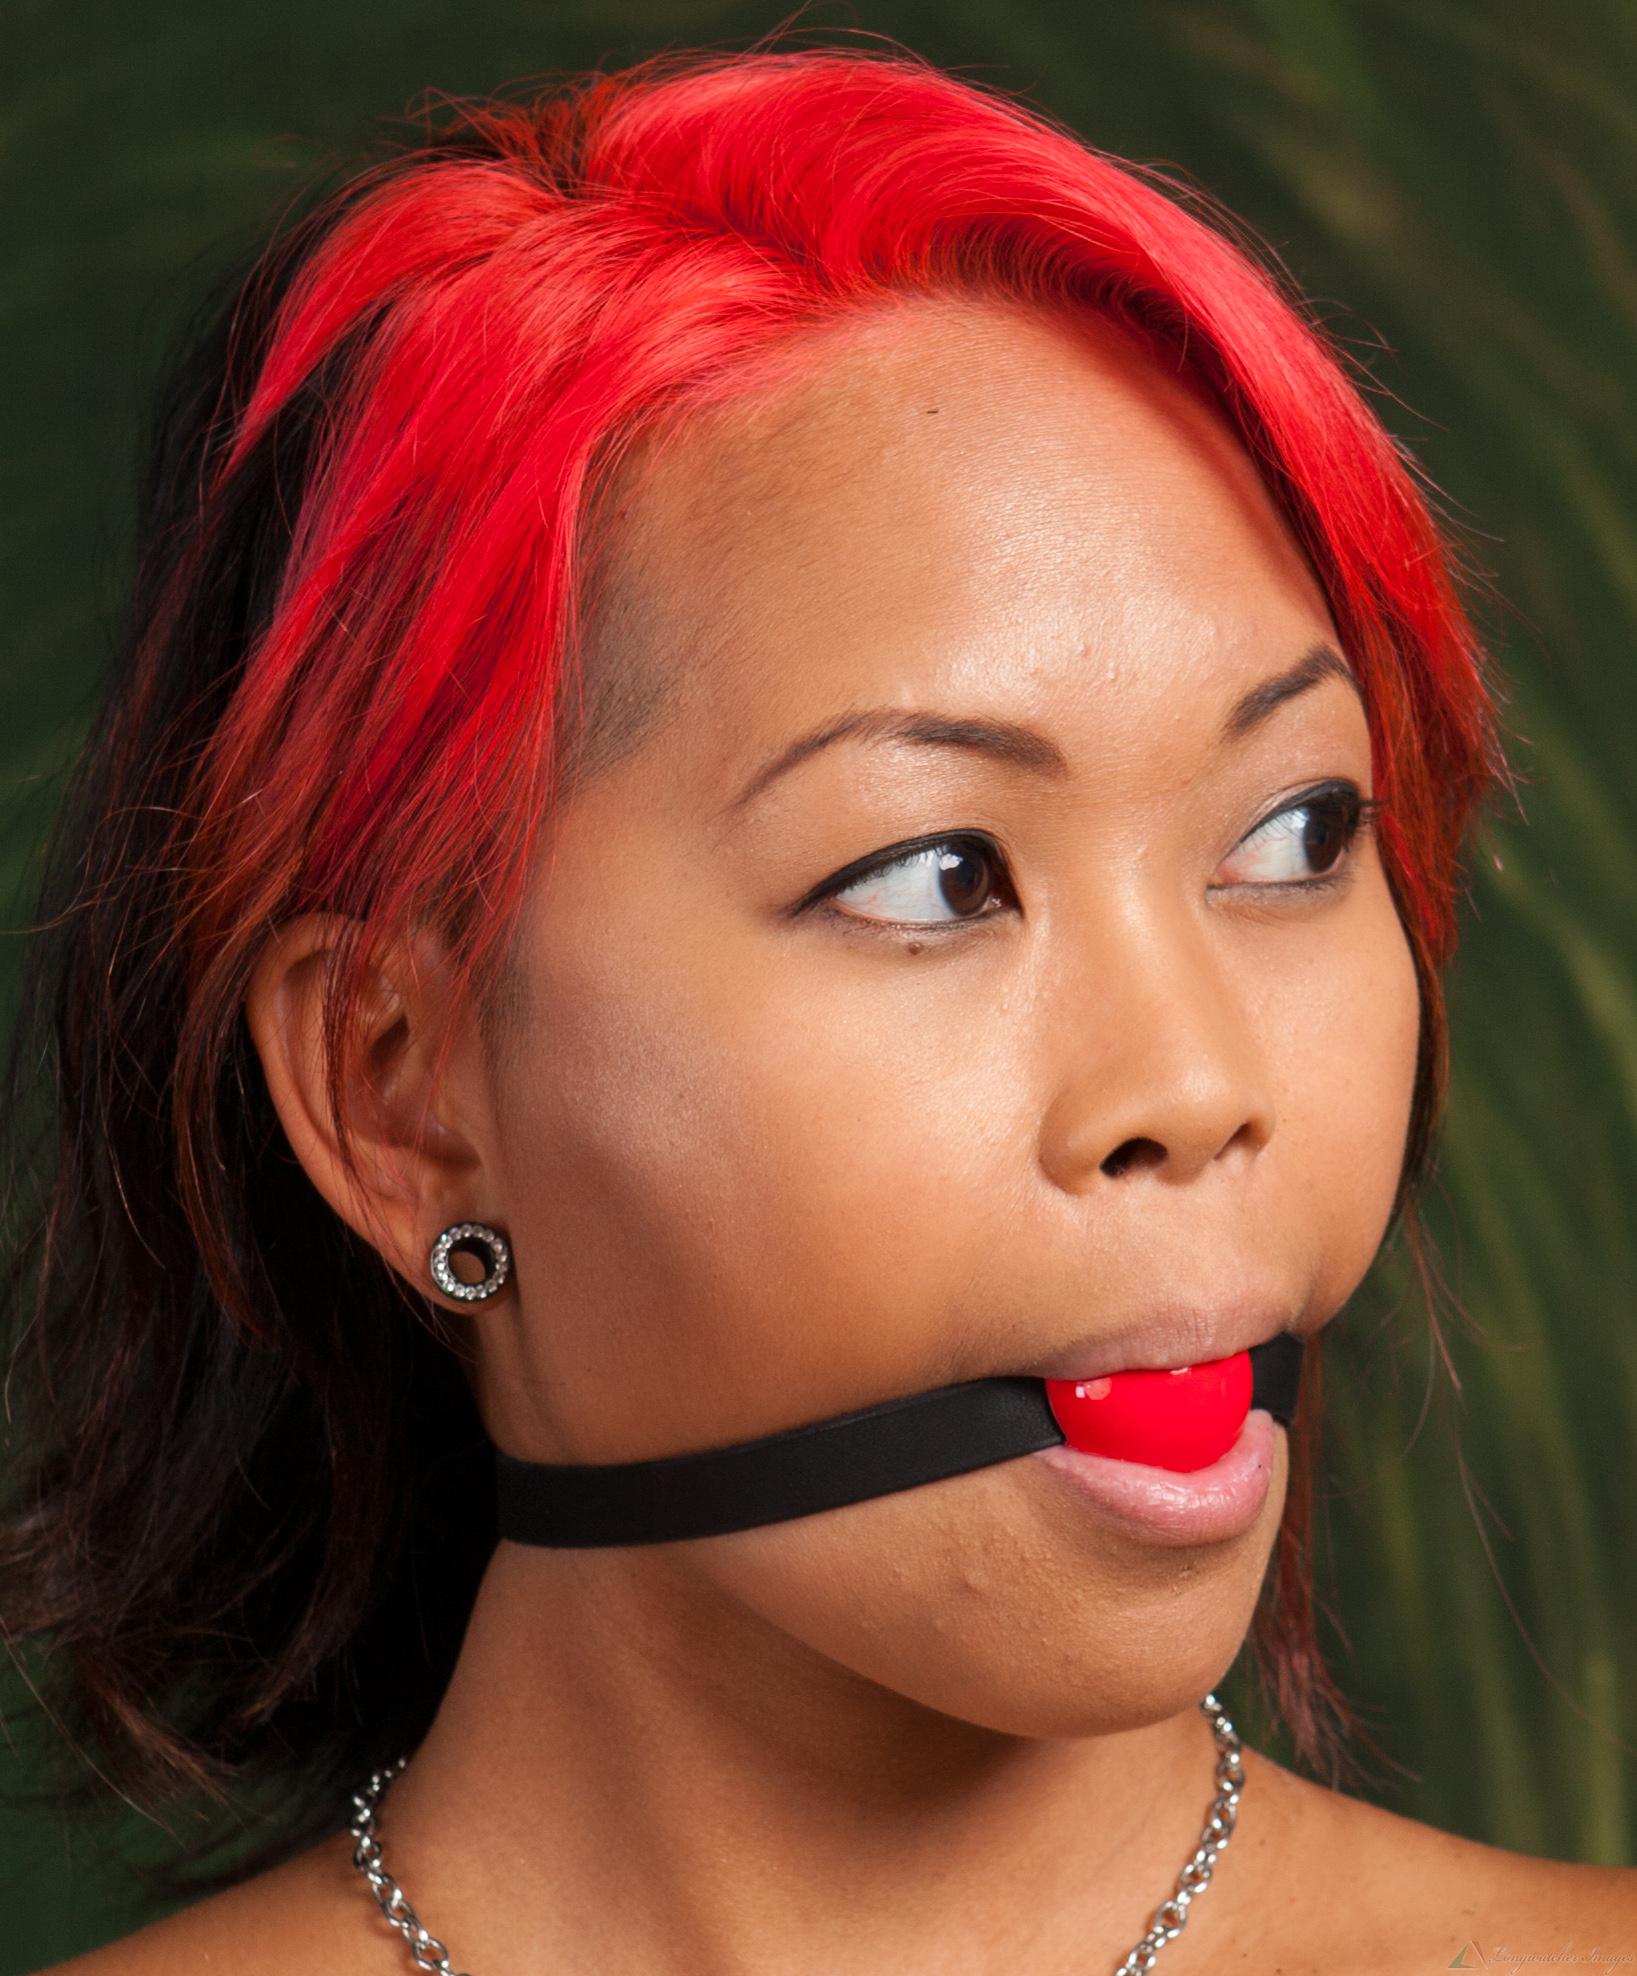 Red ball gagged